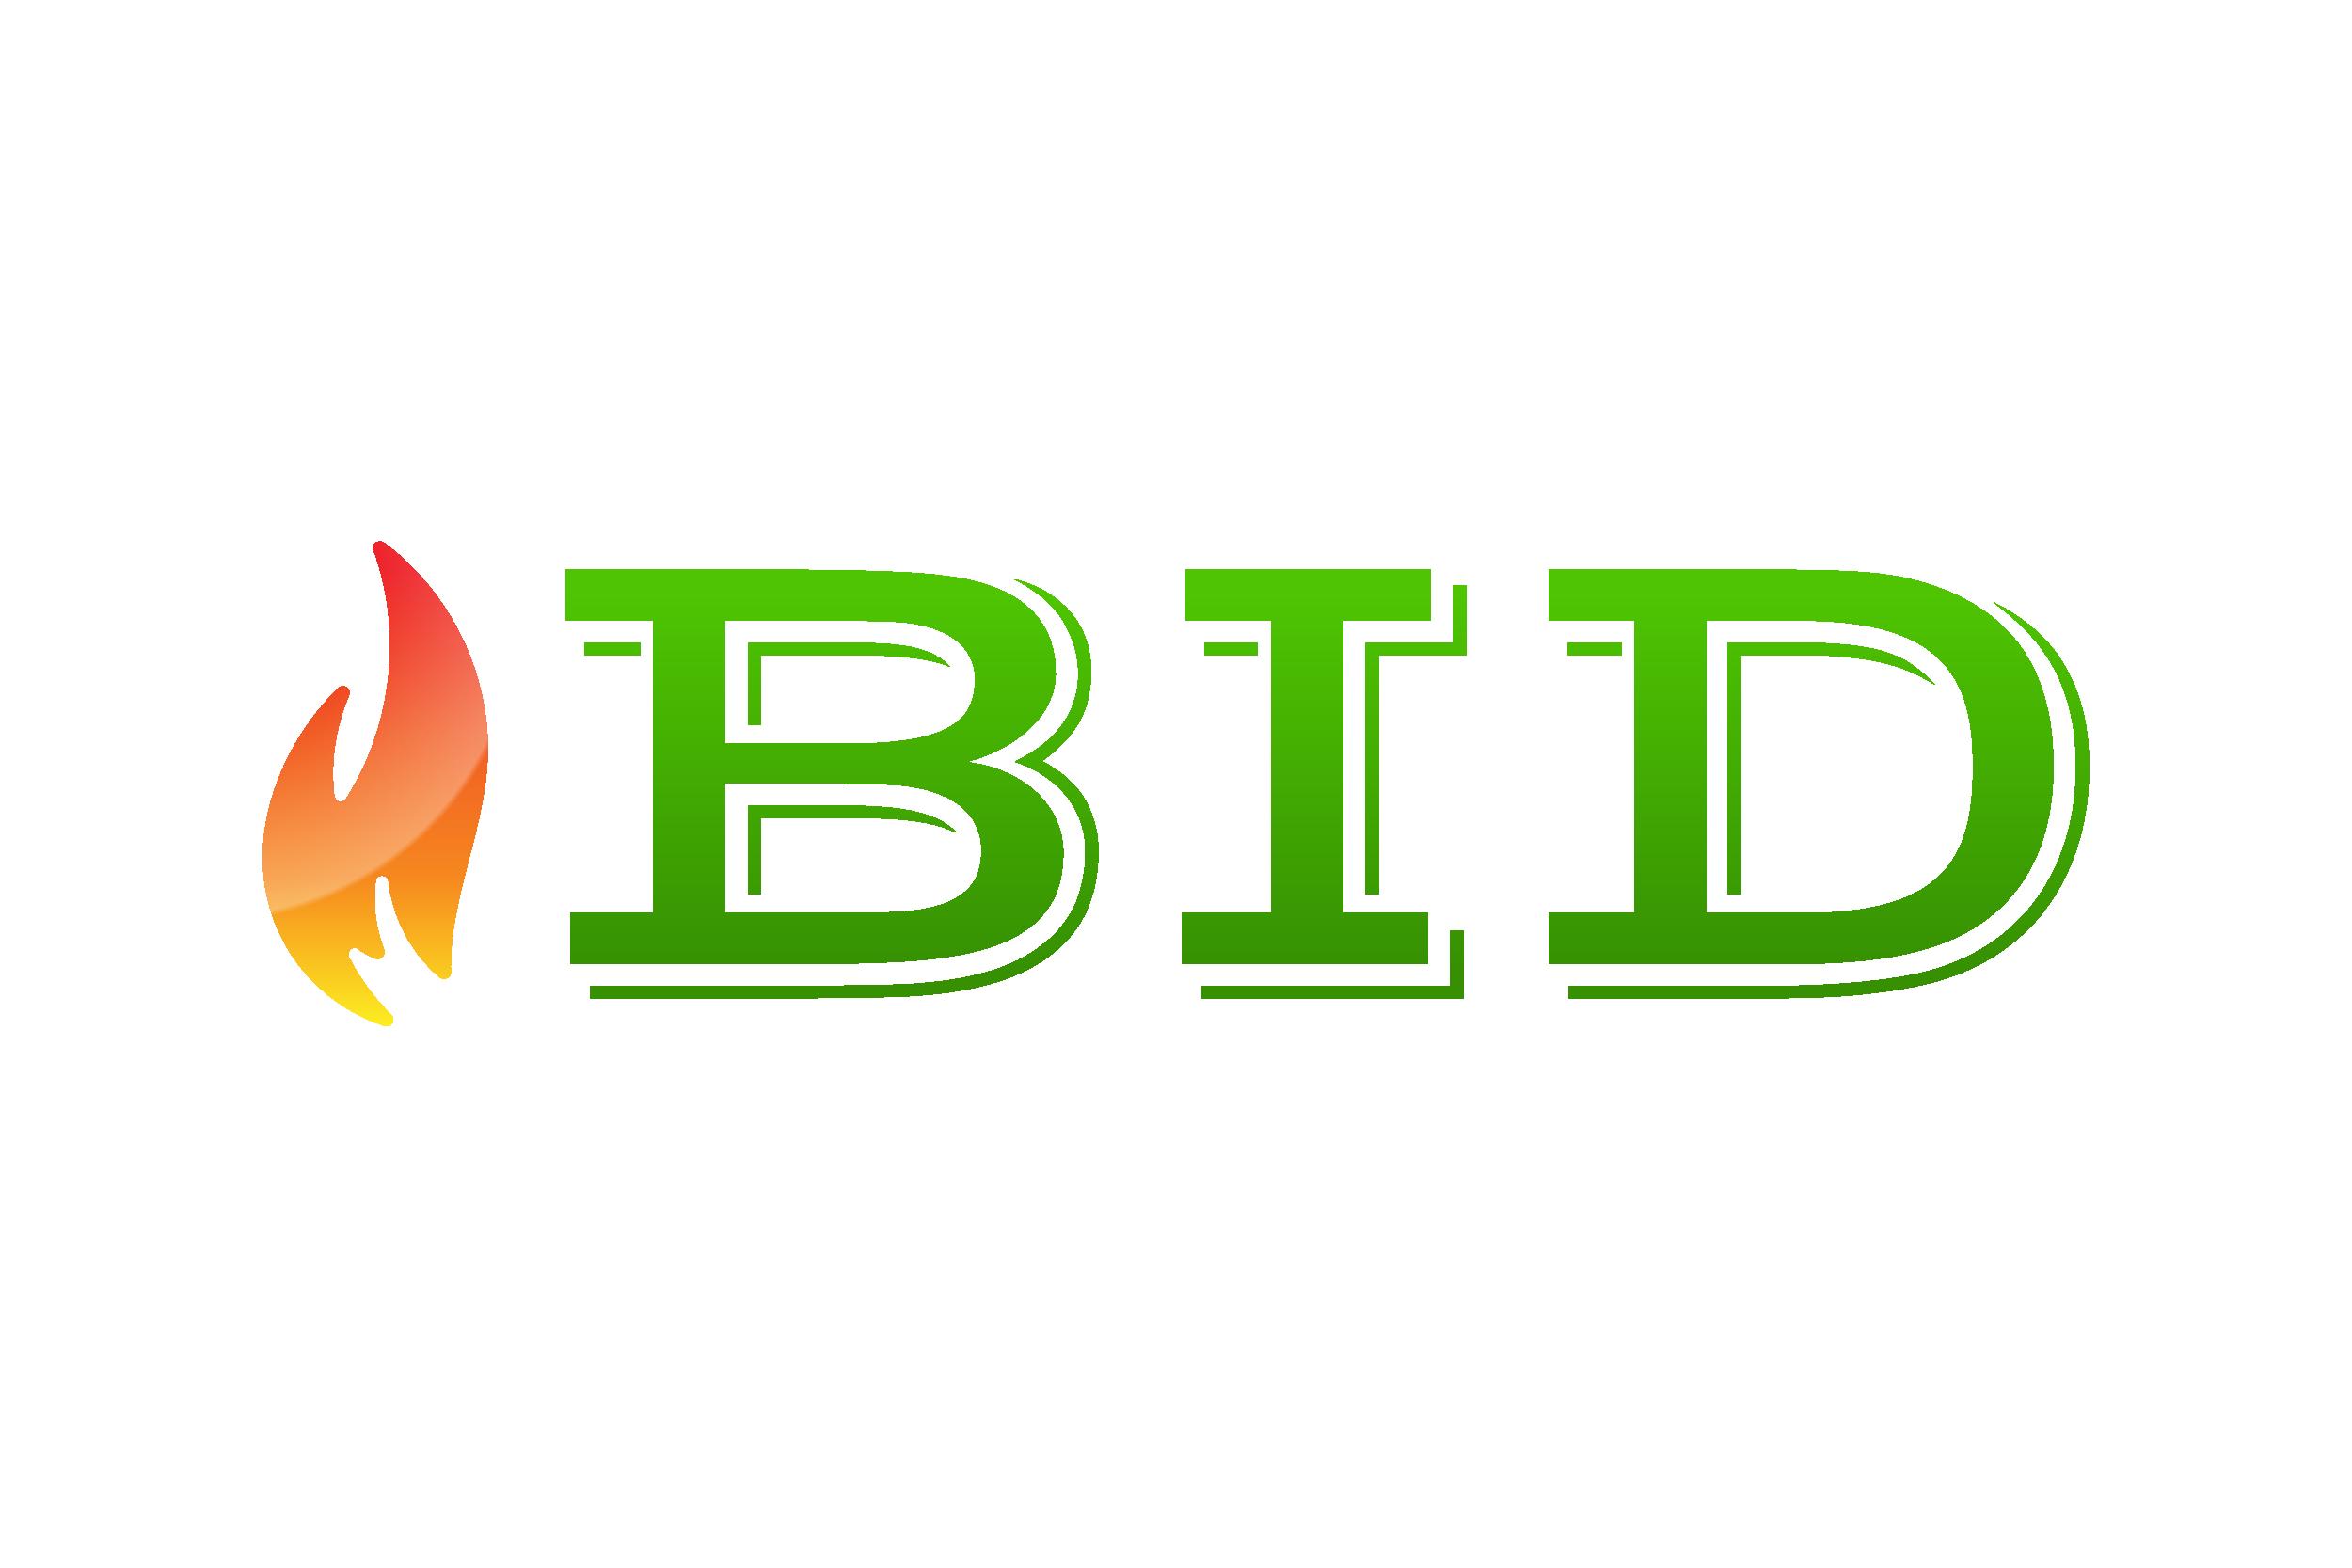 bidfiresafety.com